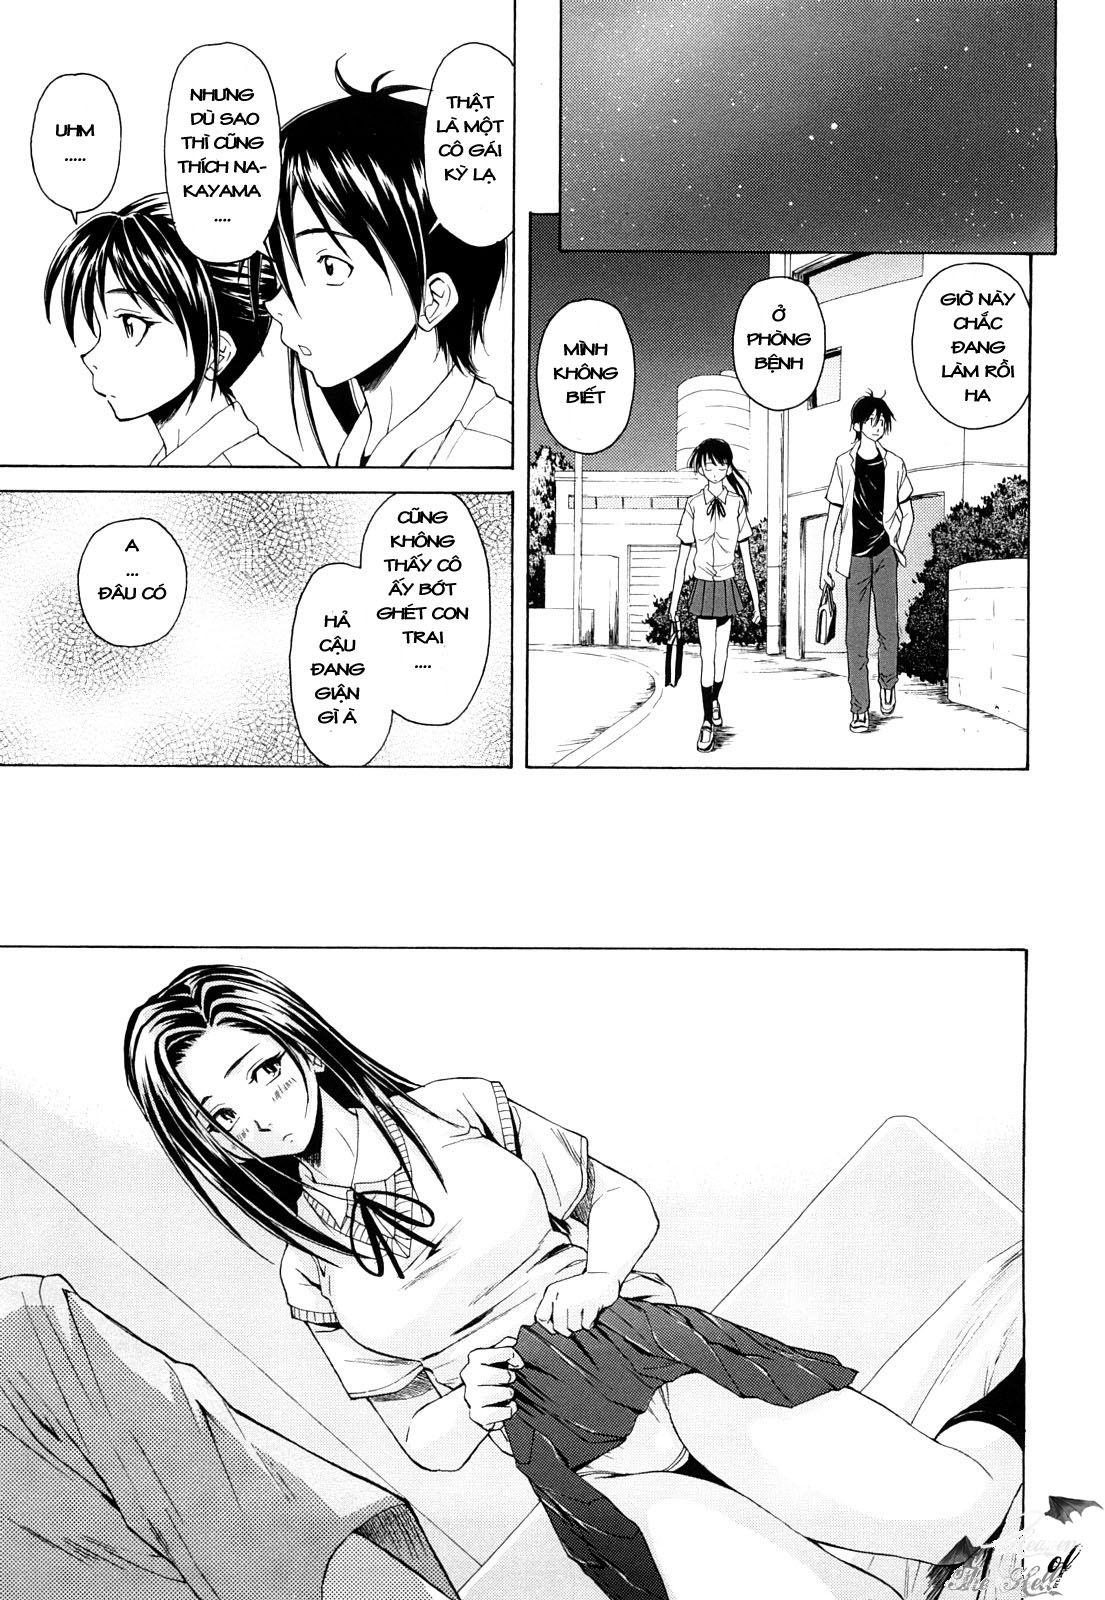 TruyenHay.Com - Ảnh 16 - Setsunai Omoi Chapter 3